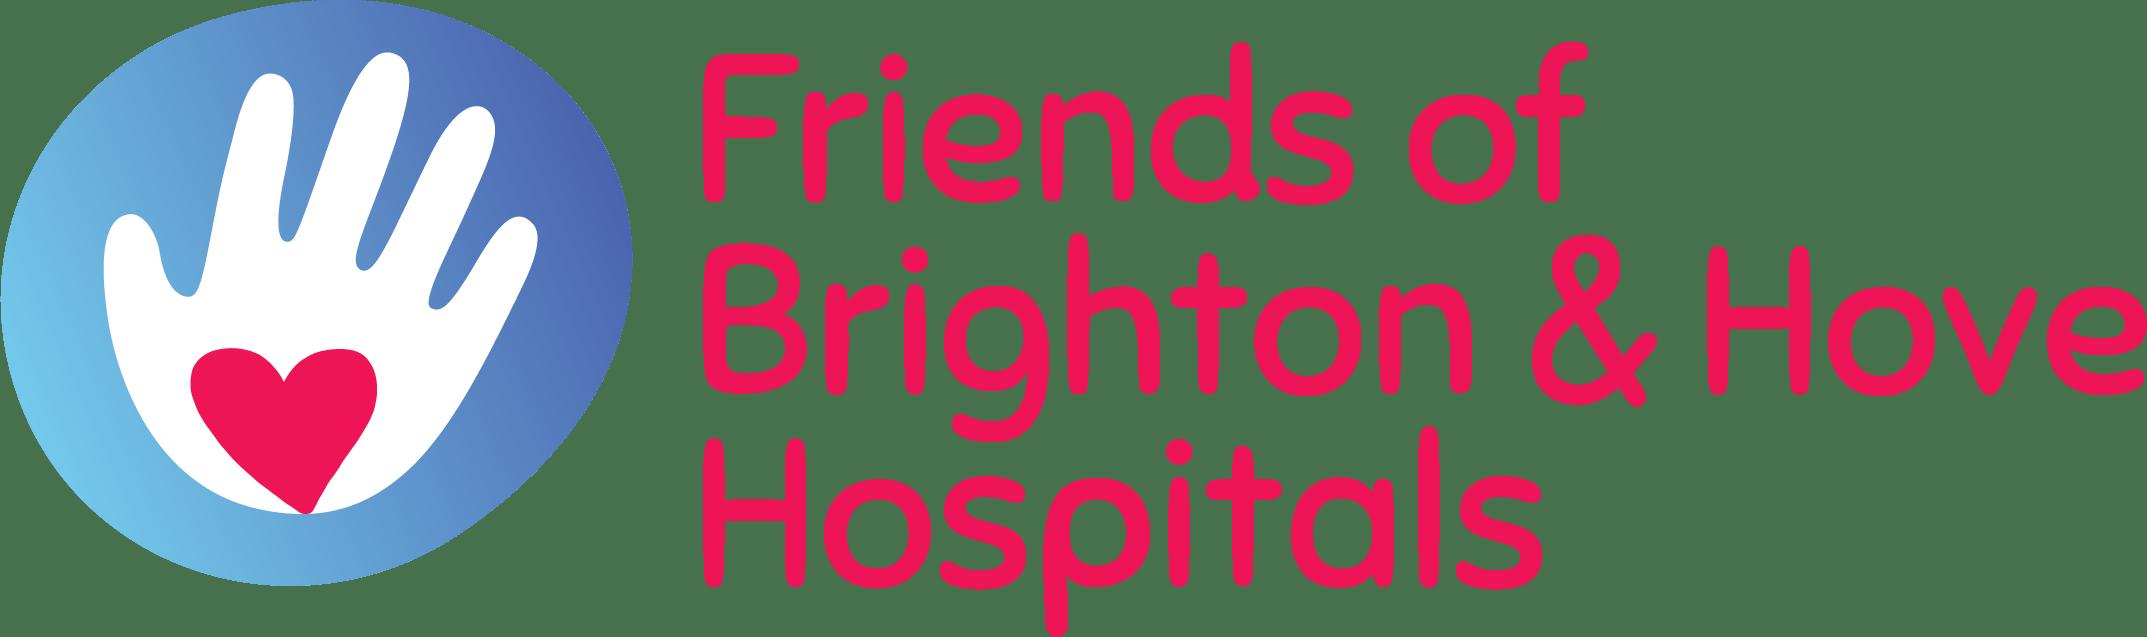 Friends of Brighton & Hove Hospitals